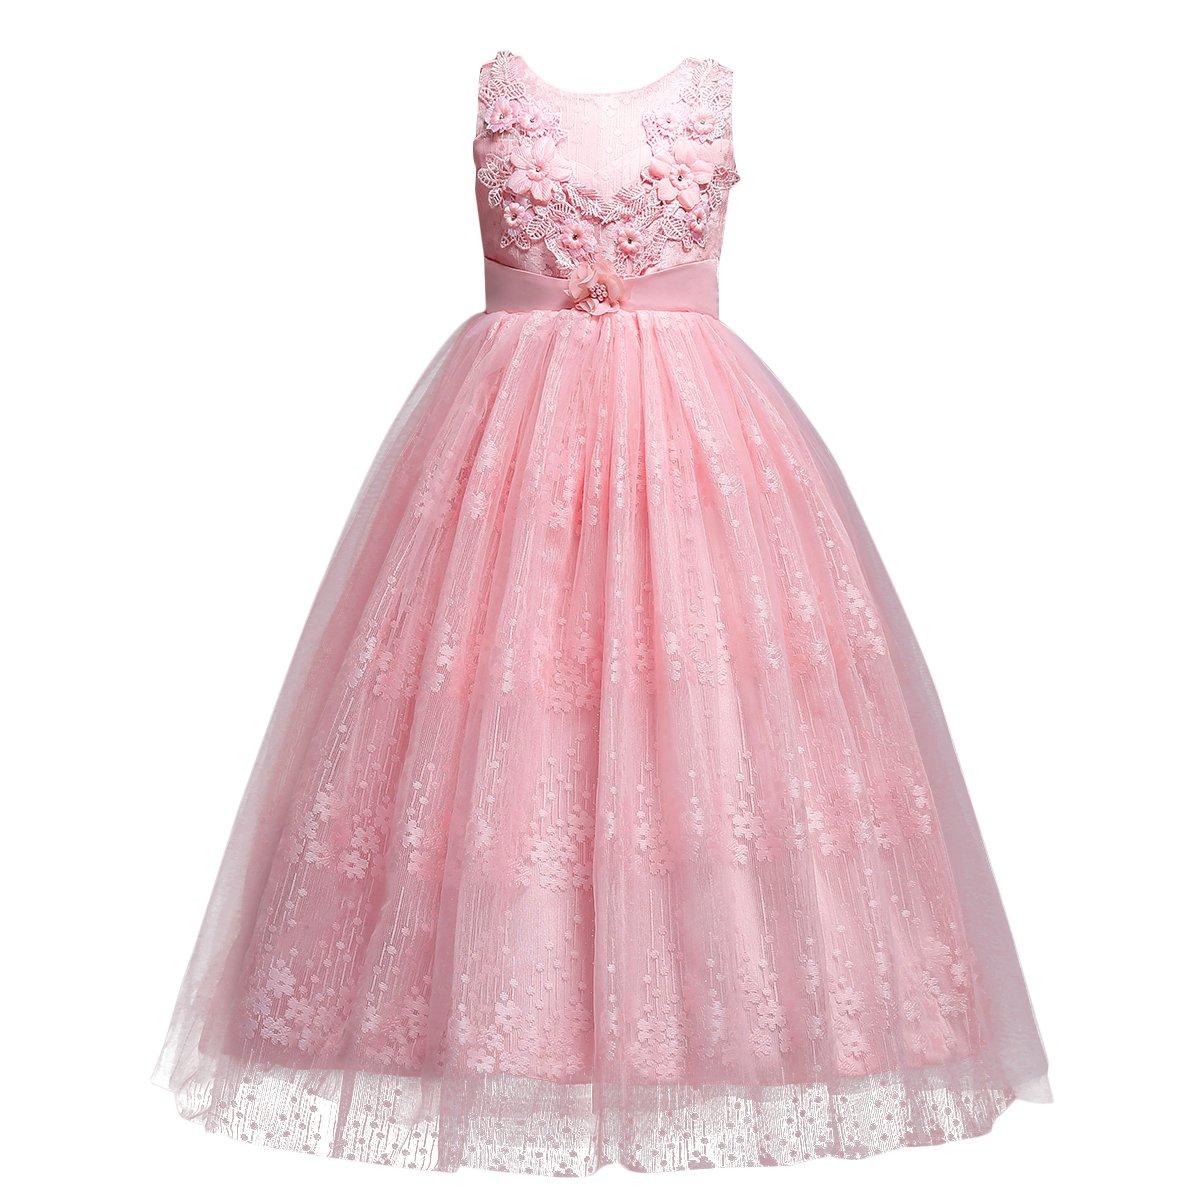 0e74b7d6ac9b Amazon.com  Girls Flower Vintage Lace Princess Dress for Kids Tulle ...